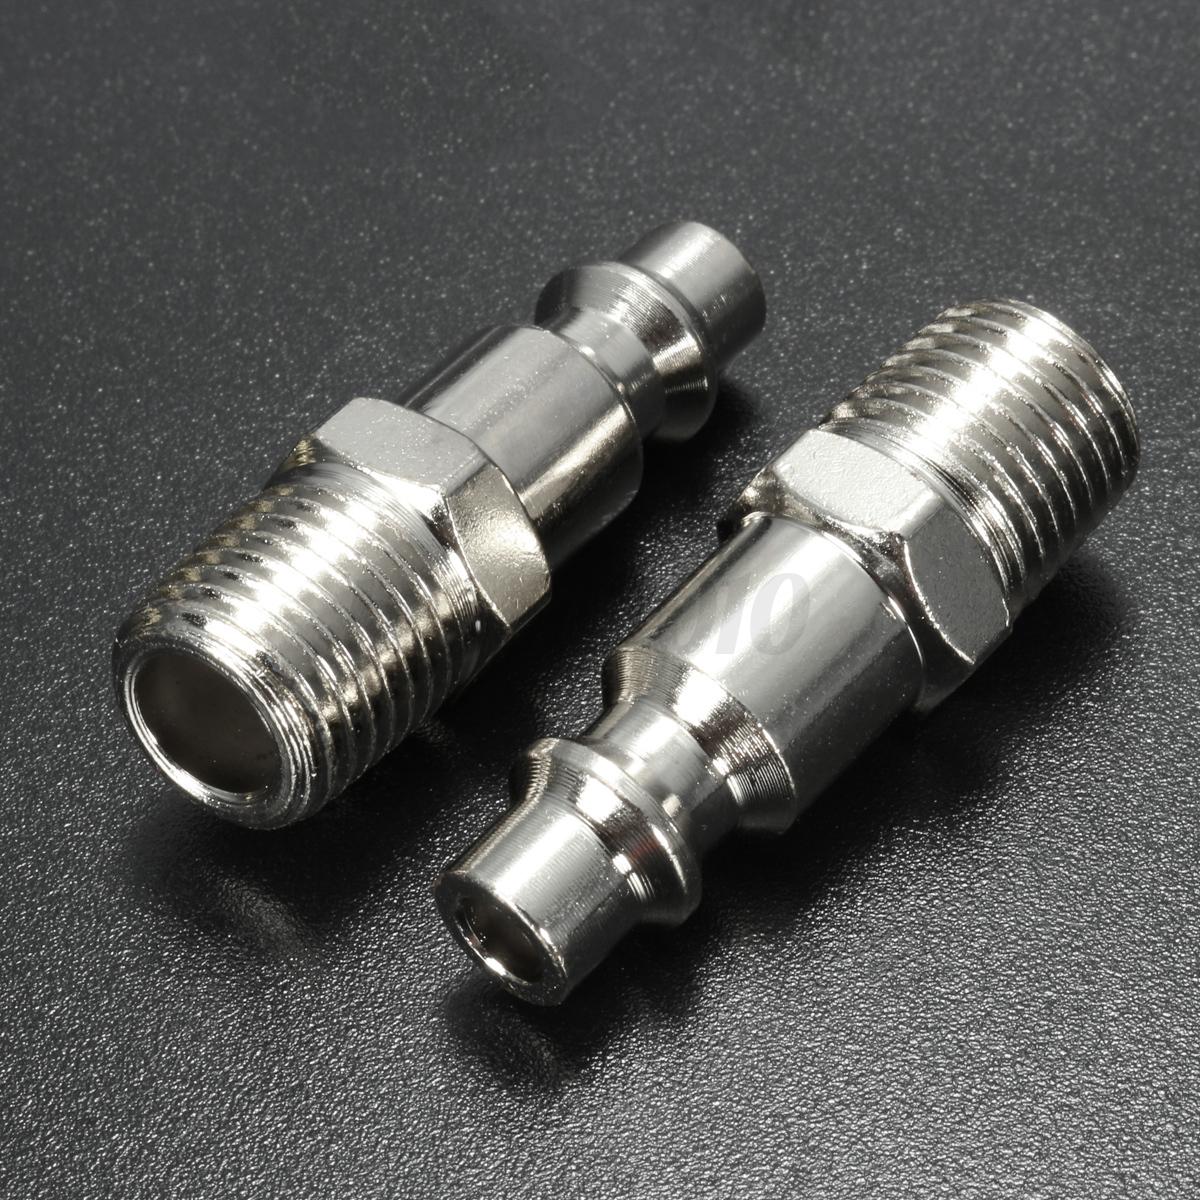 Air Blower Nozzle : Pc compressor air duster compressed nozzle blow gun